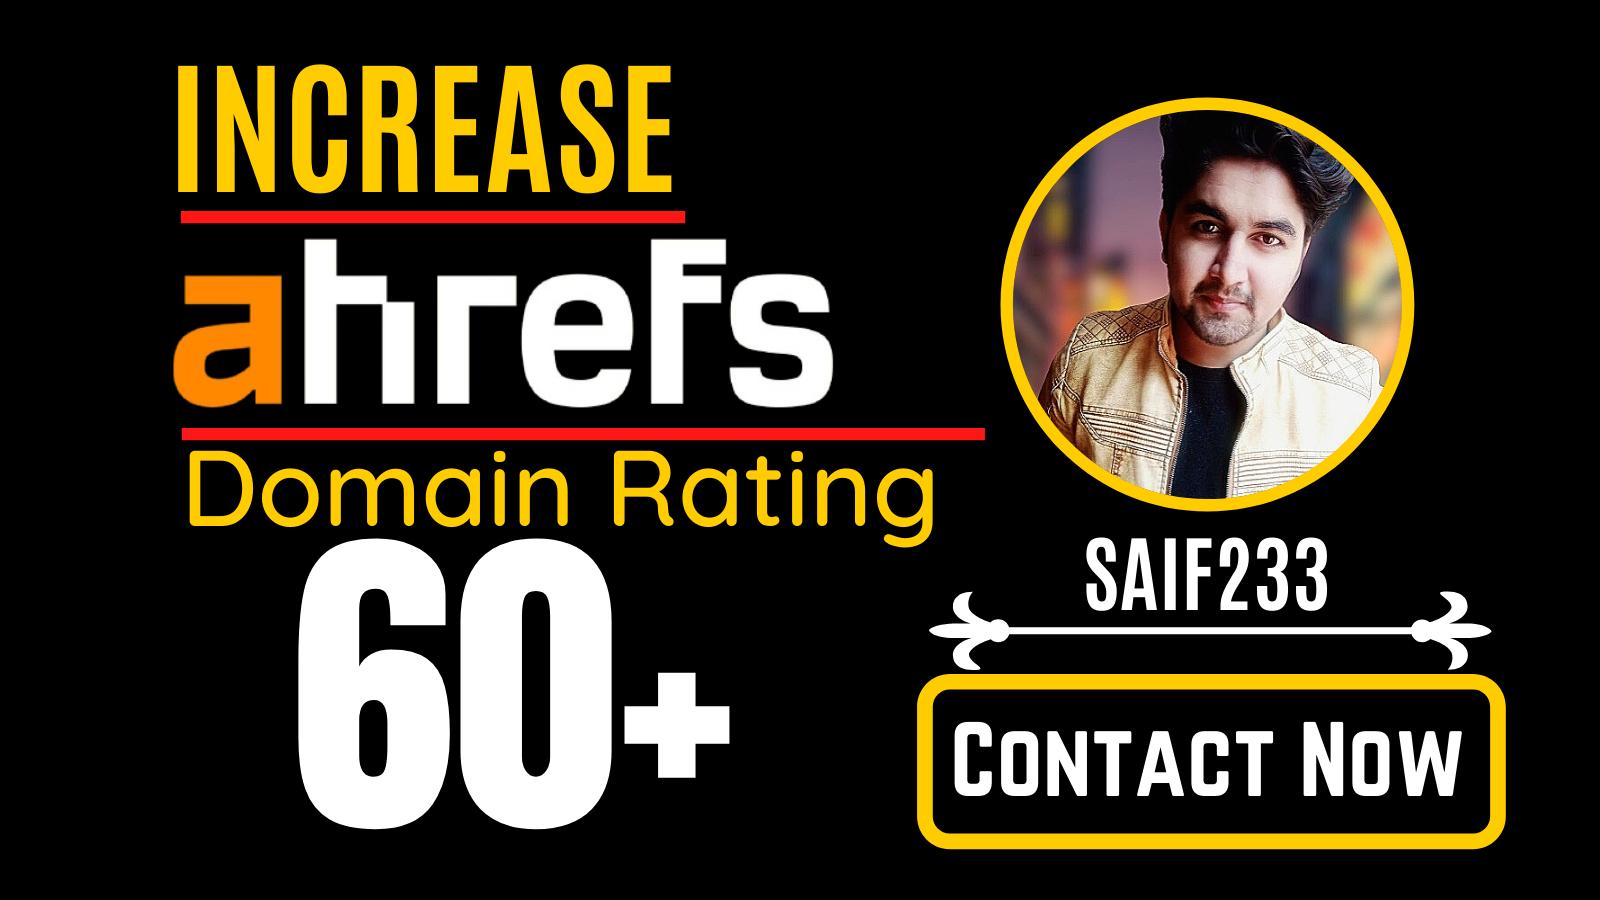 increase ahrefs domain rating,  increase ahrefs DR 60 plus